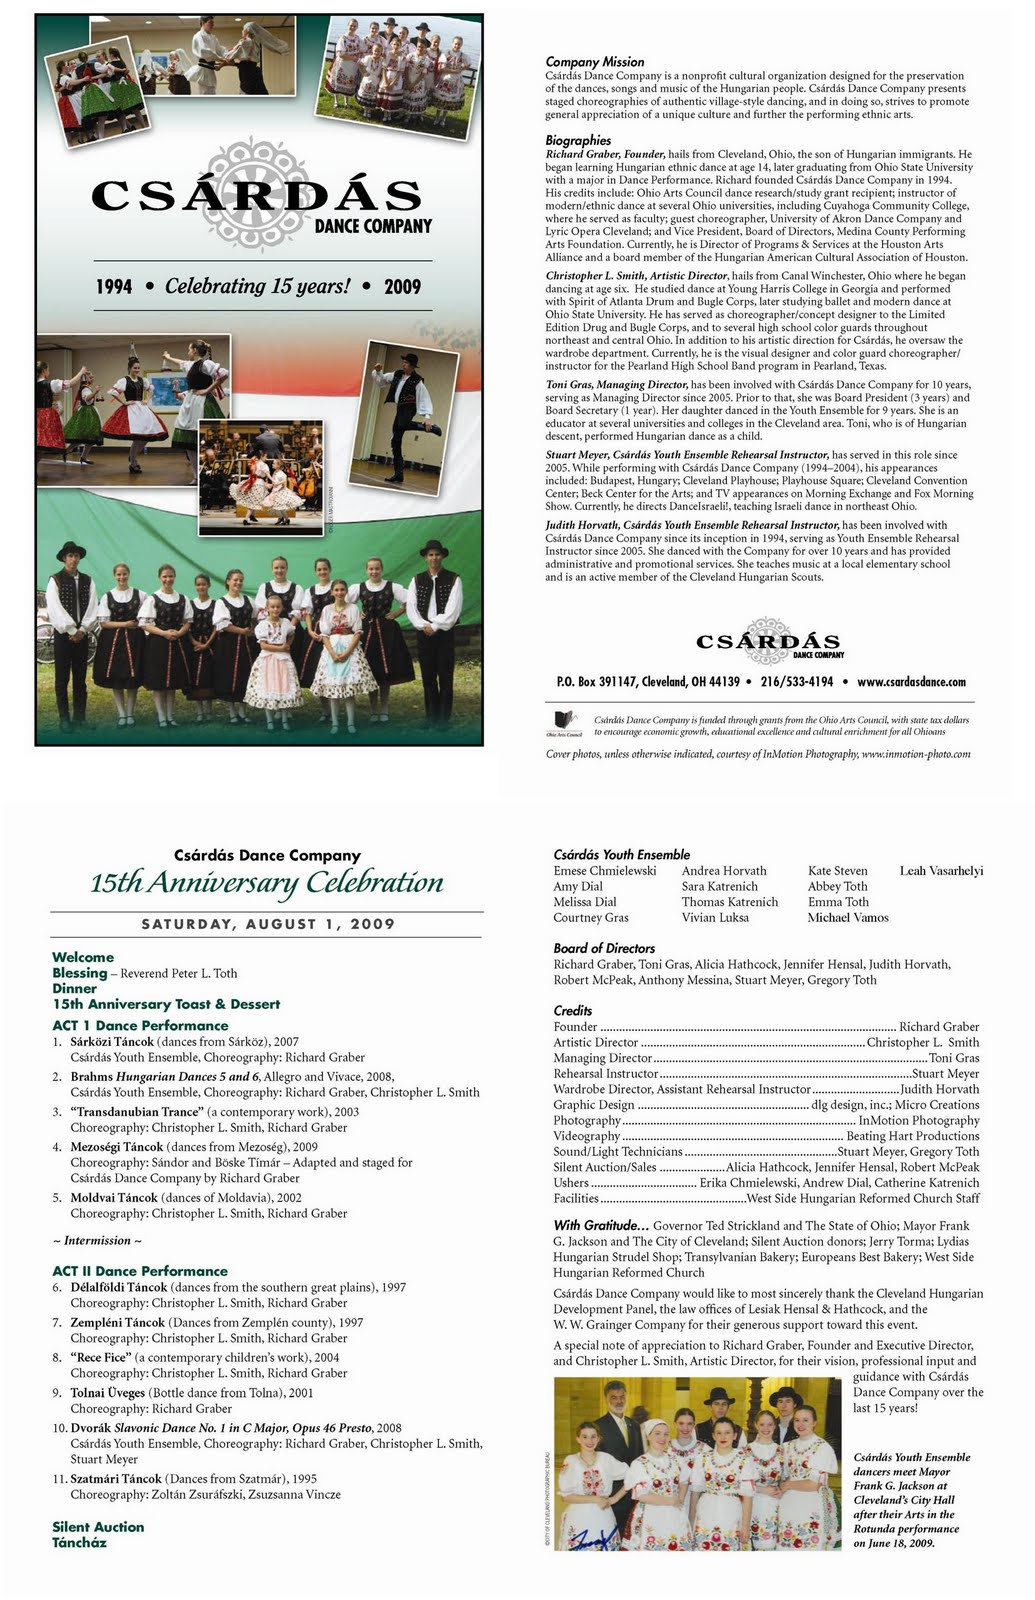 [Csardas+15th+Anniversary+Program-1.jpg]